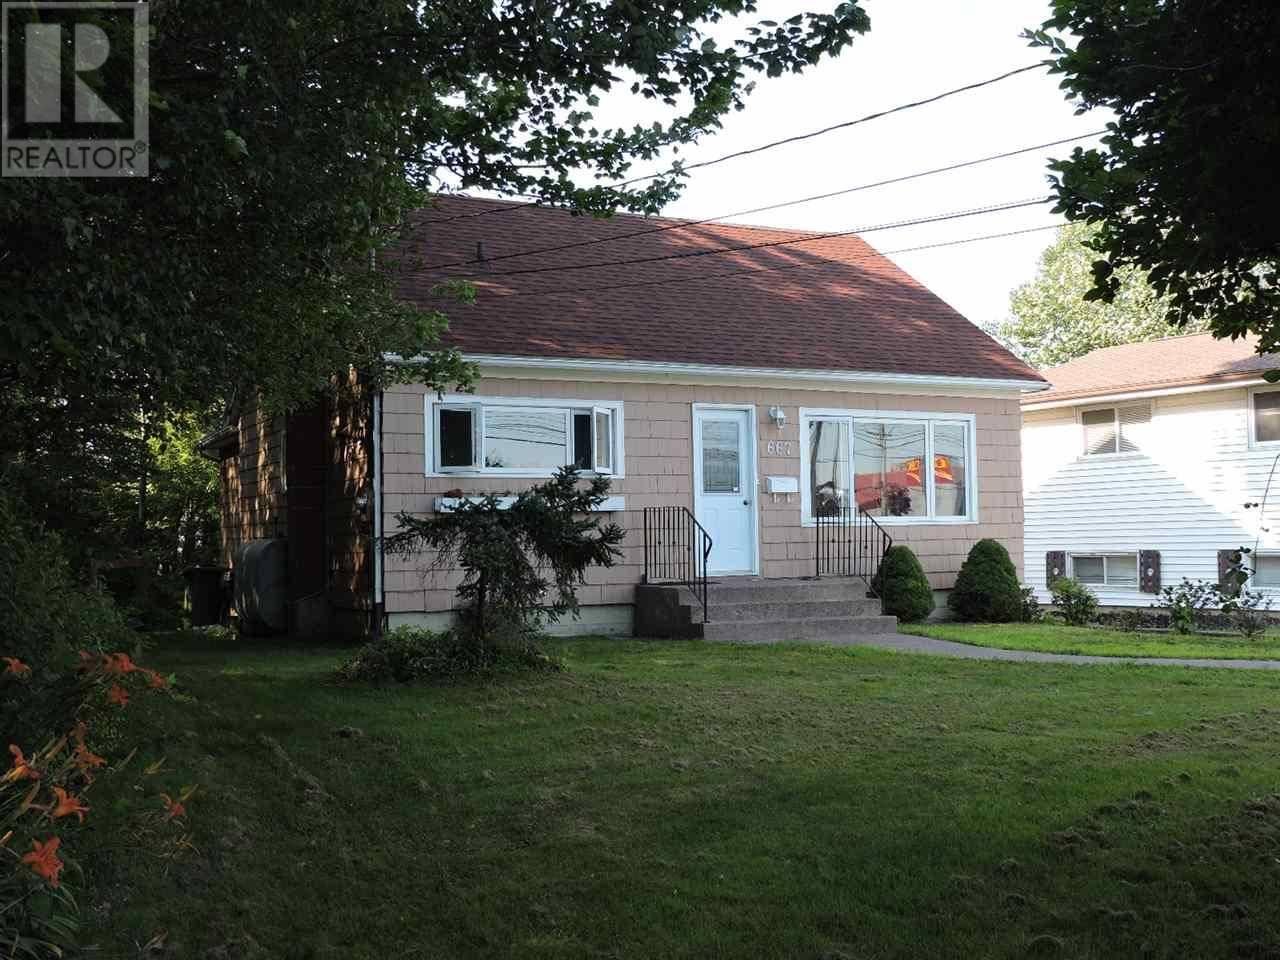 House for sale at 667 Portland St Dartmouth Nova Scotia - MLS: 201918452